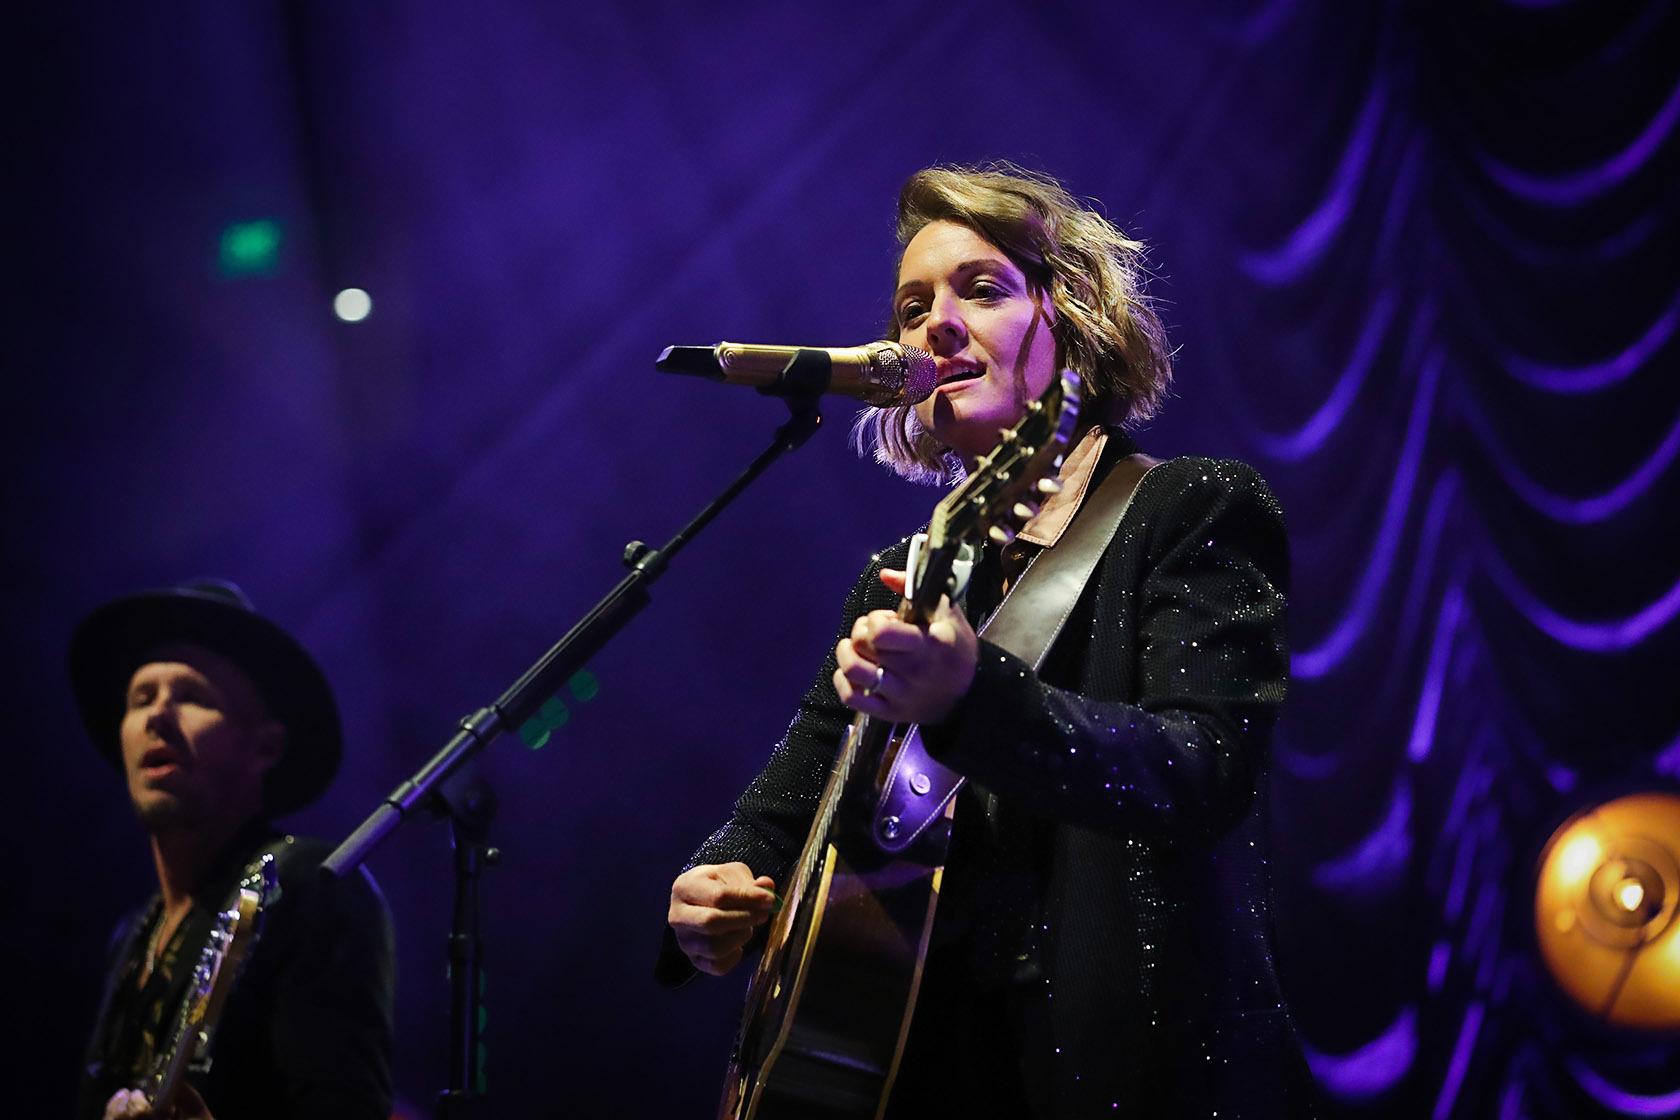 Brandi Carlile performs at the Vivint Arena on Feb. 8, 2020.